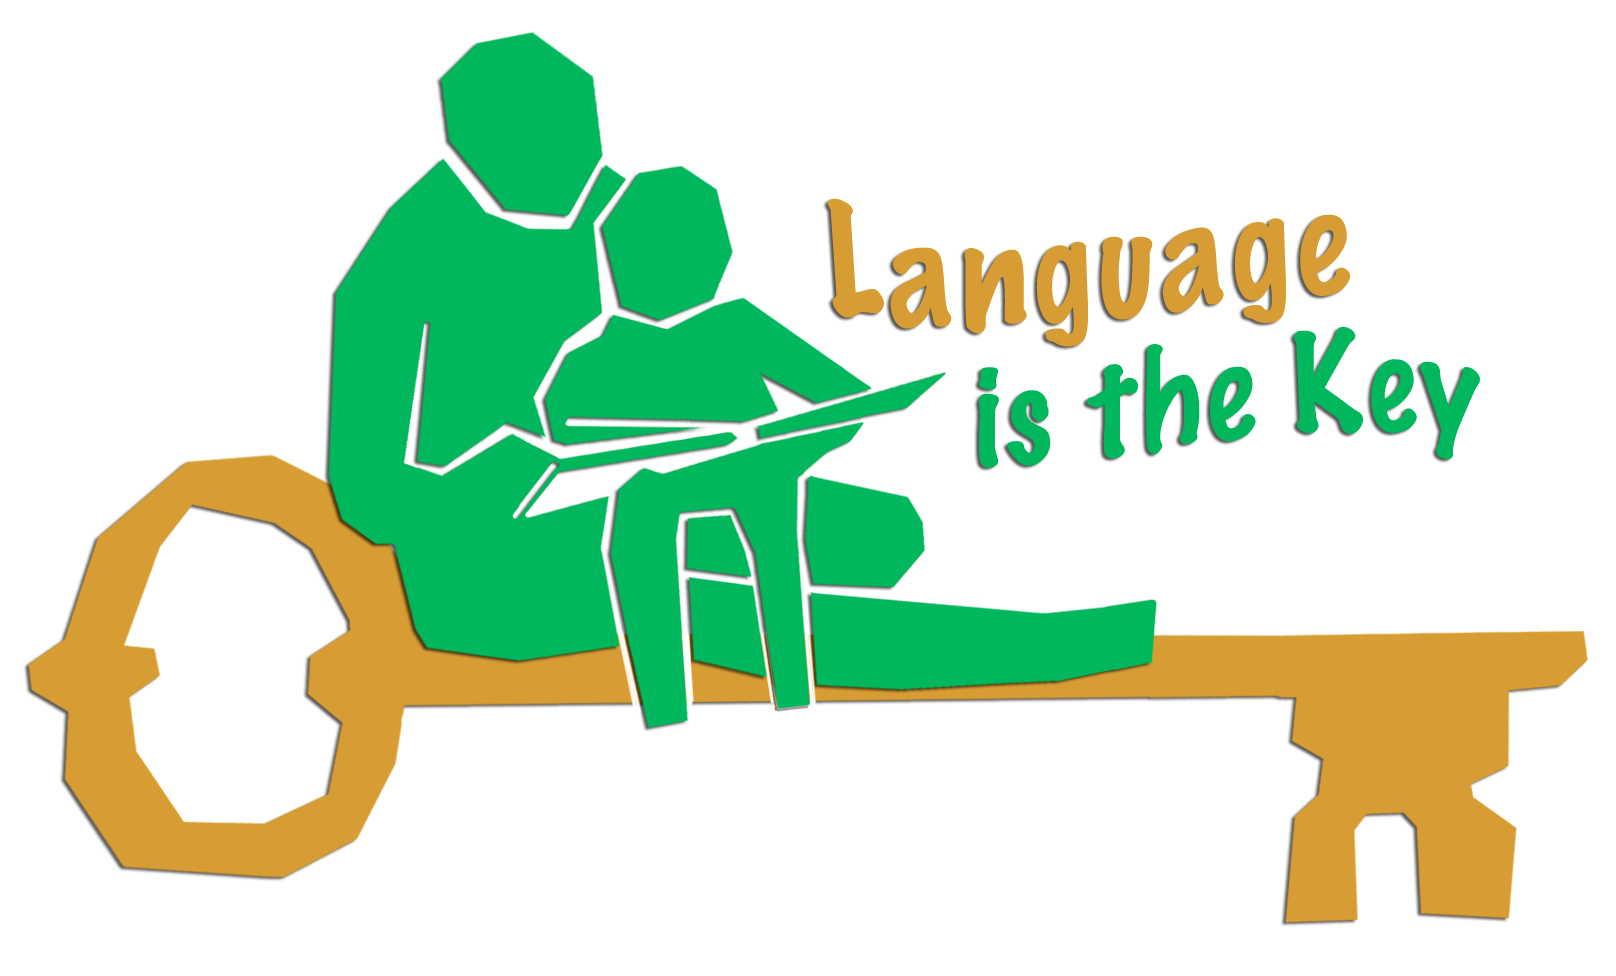 website key language